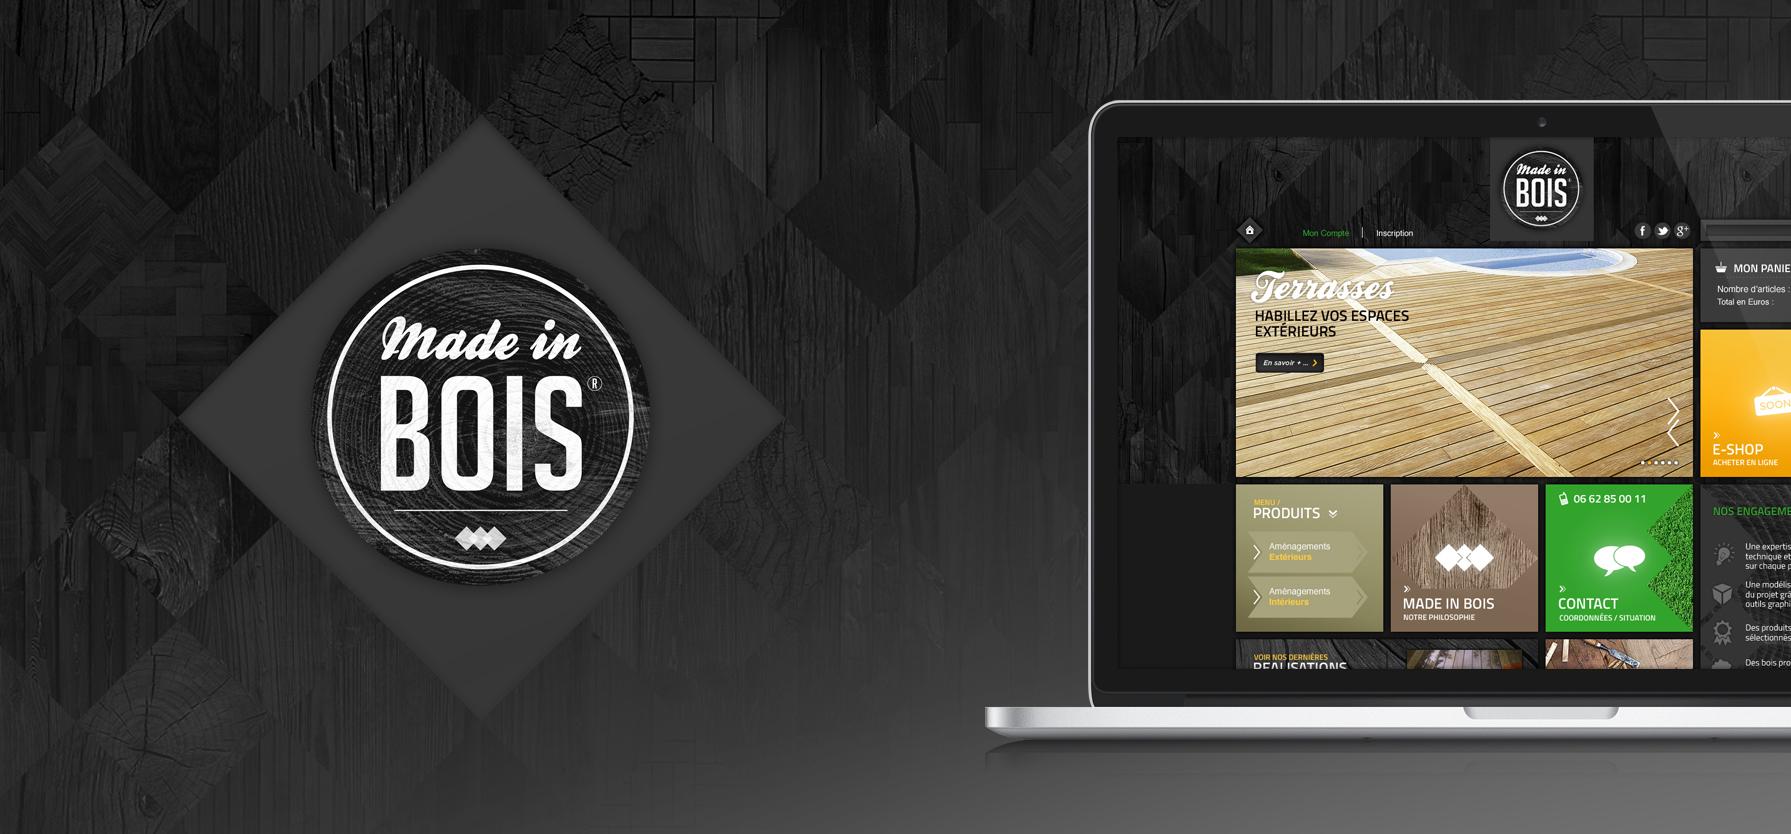 madeinbois_web-01